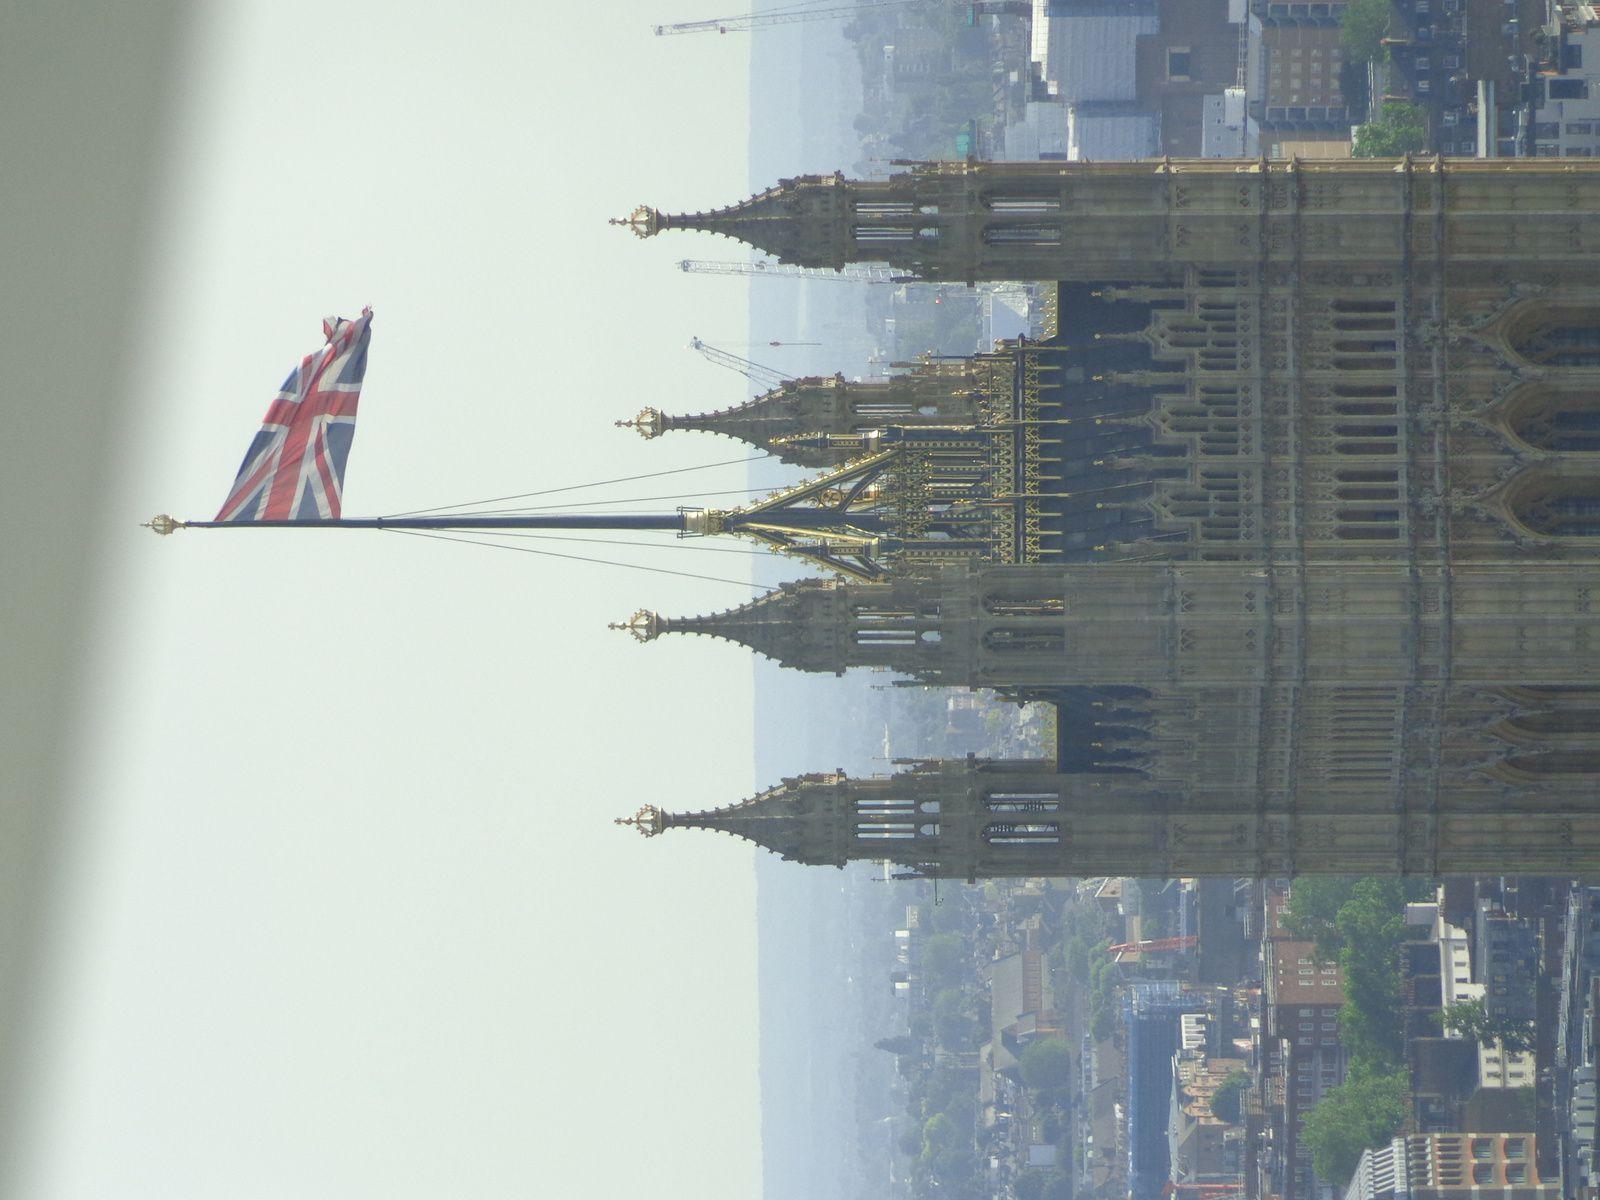 Vacances londoniennes (1)